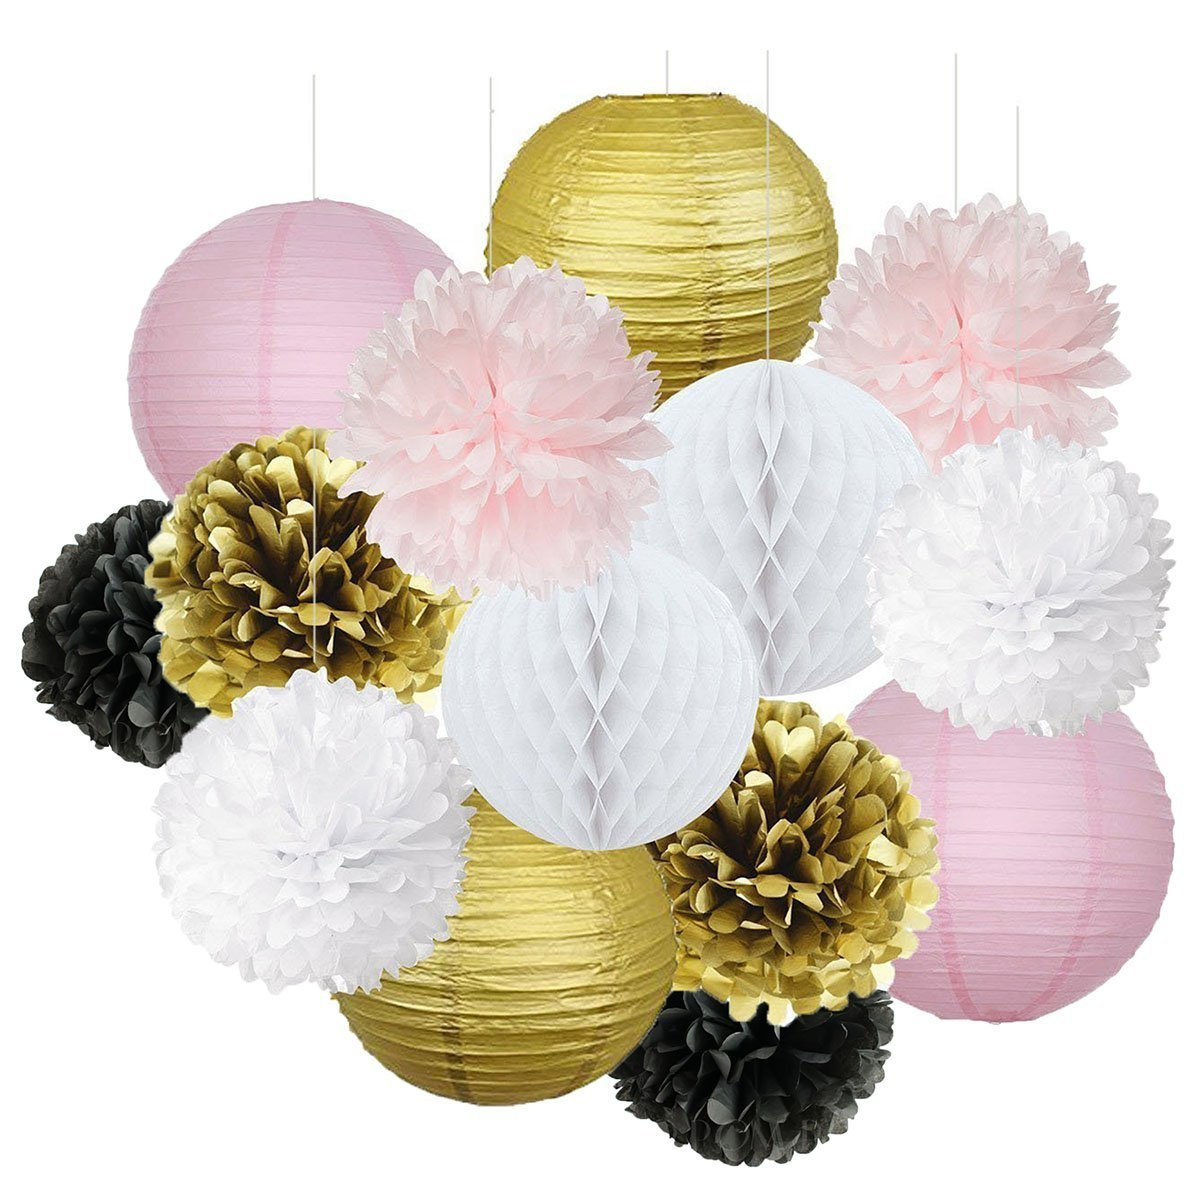 Furuix 14pcs Pink Gold White Black Paris Party Decoration Kit Tissue Paper Pom Pom Honeycomb Ball and Paper Lantern for Girls' Birthday Wedding Decoration Pink Baby Shower Room Decoration Party Favors